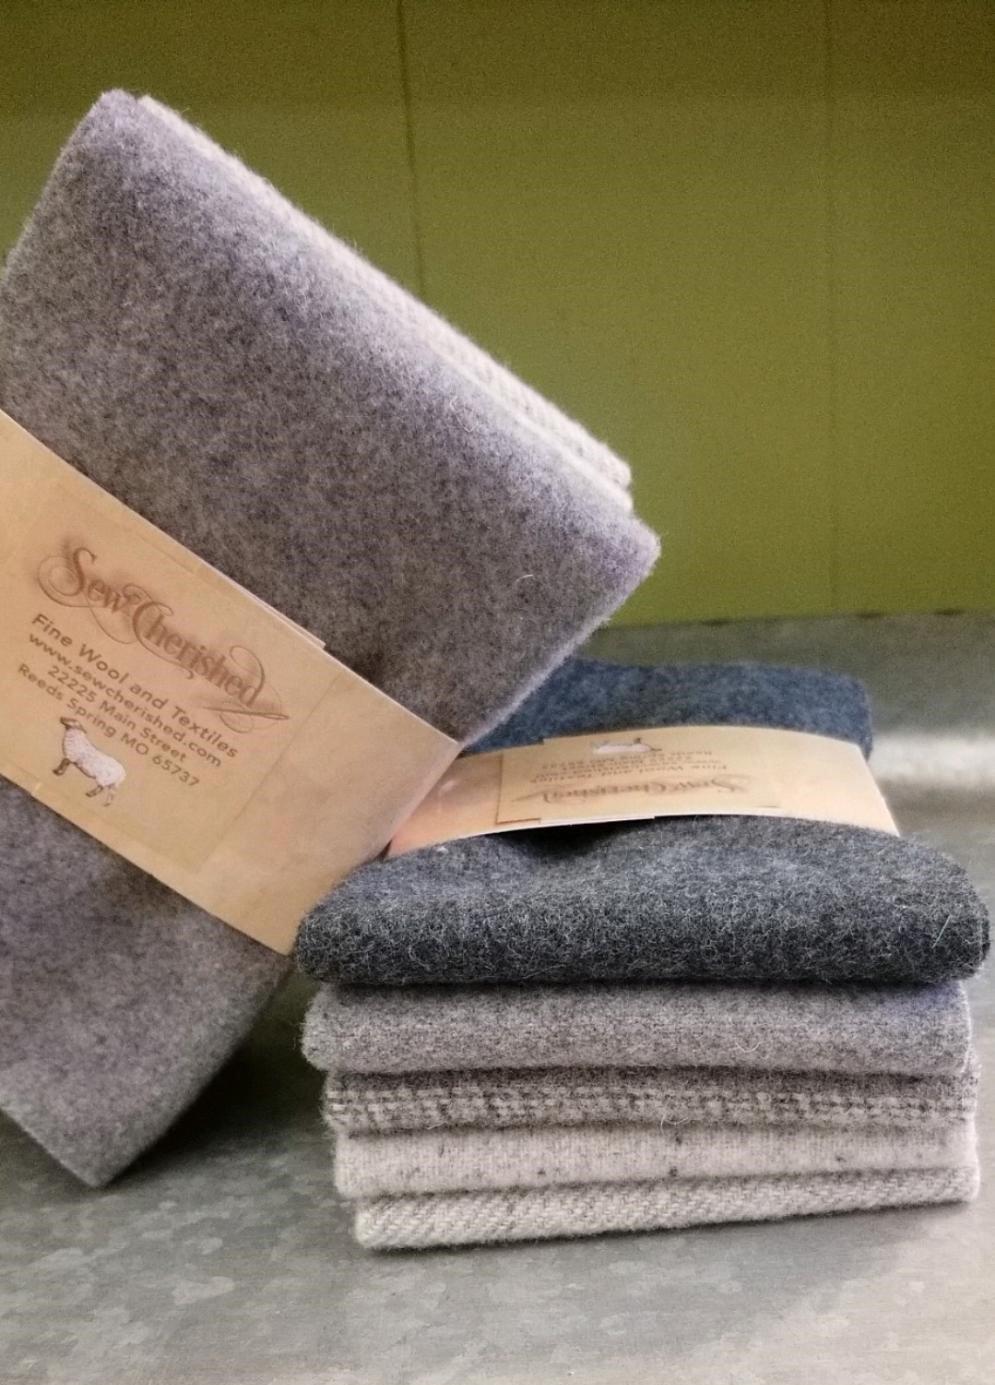 Sew Cherished Wool Buddies - shades of blue